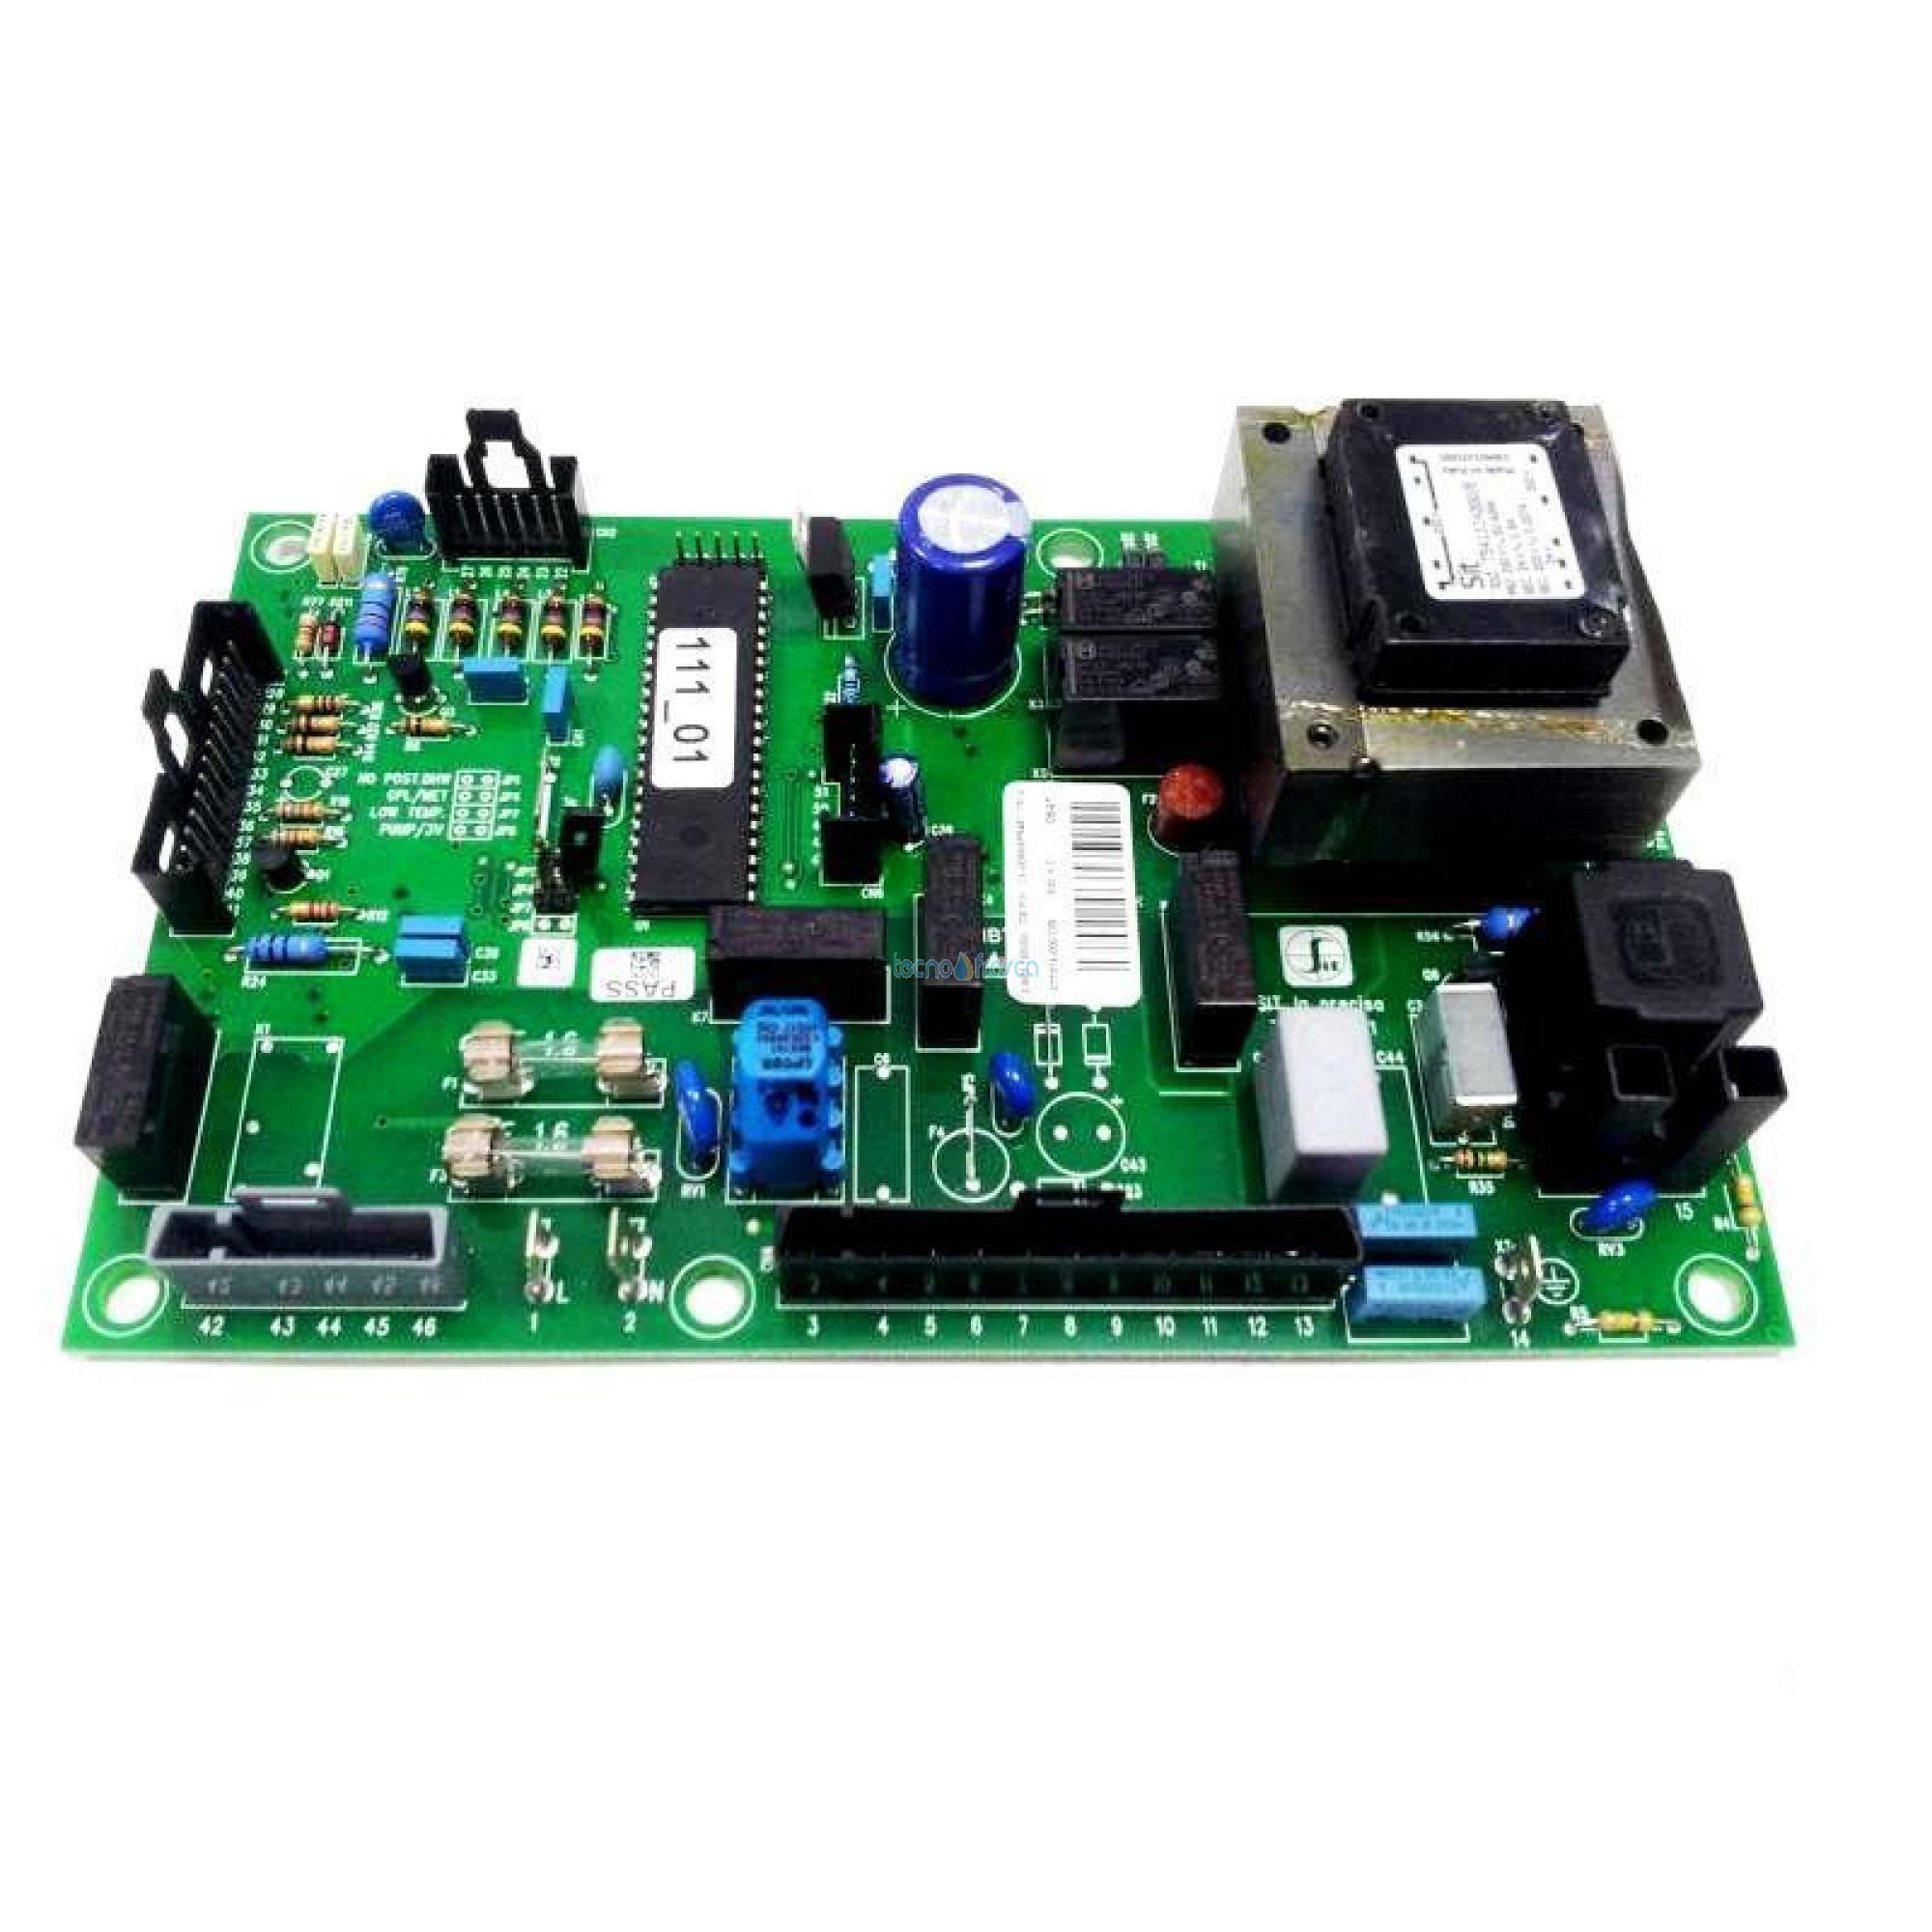 Sime scheda elettronica caldaia open zip 25bf 6301401